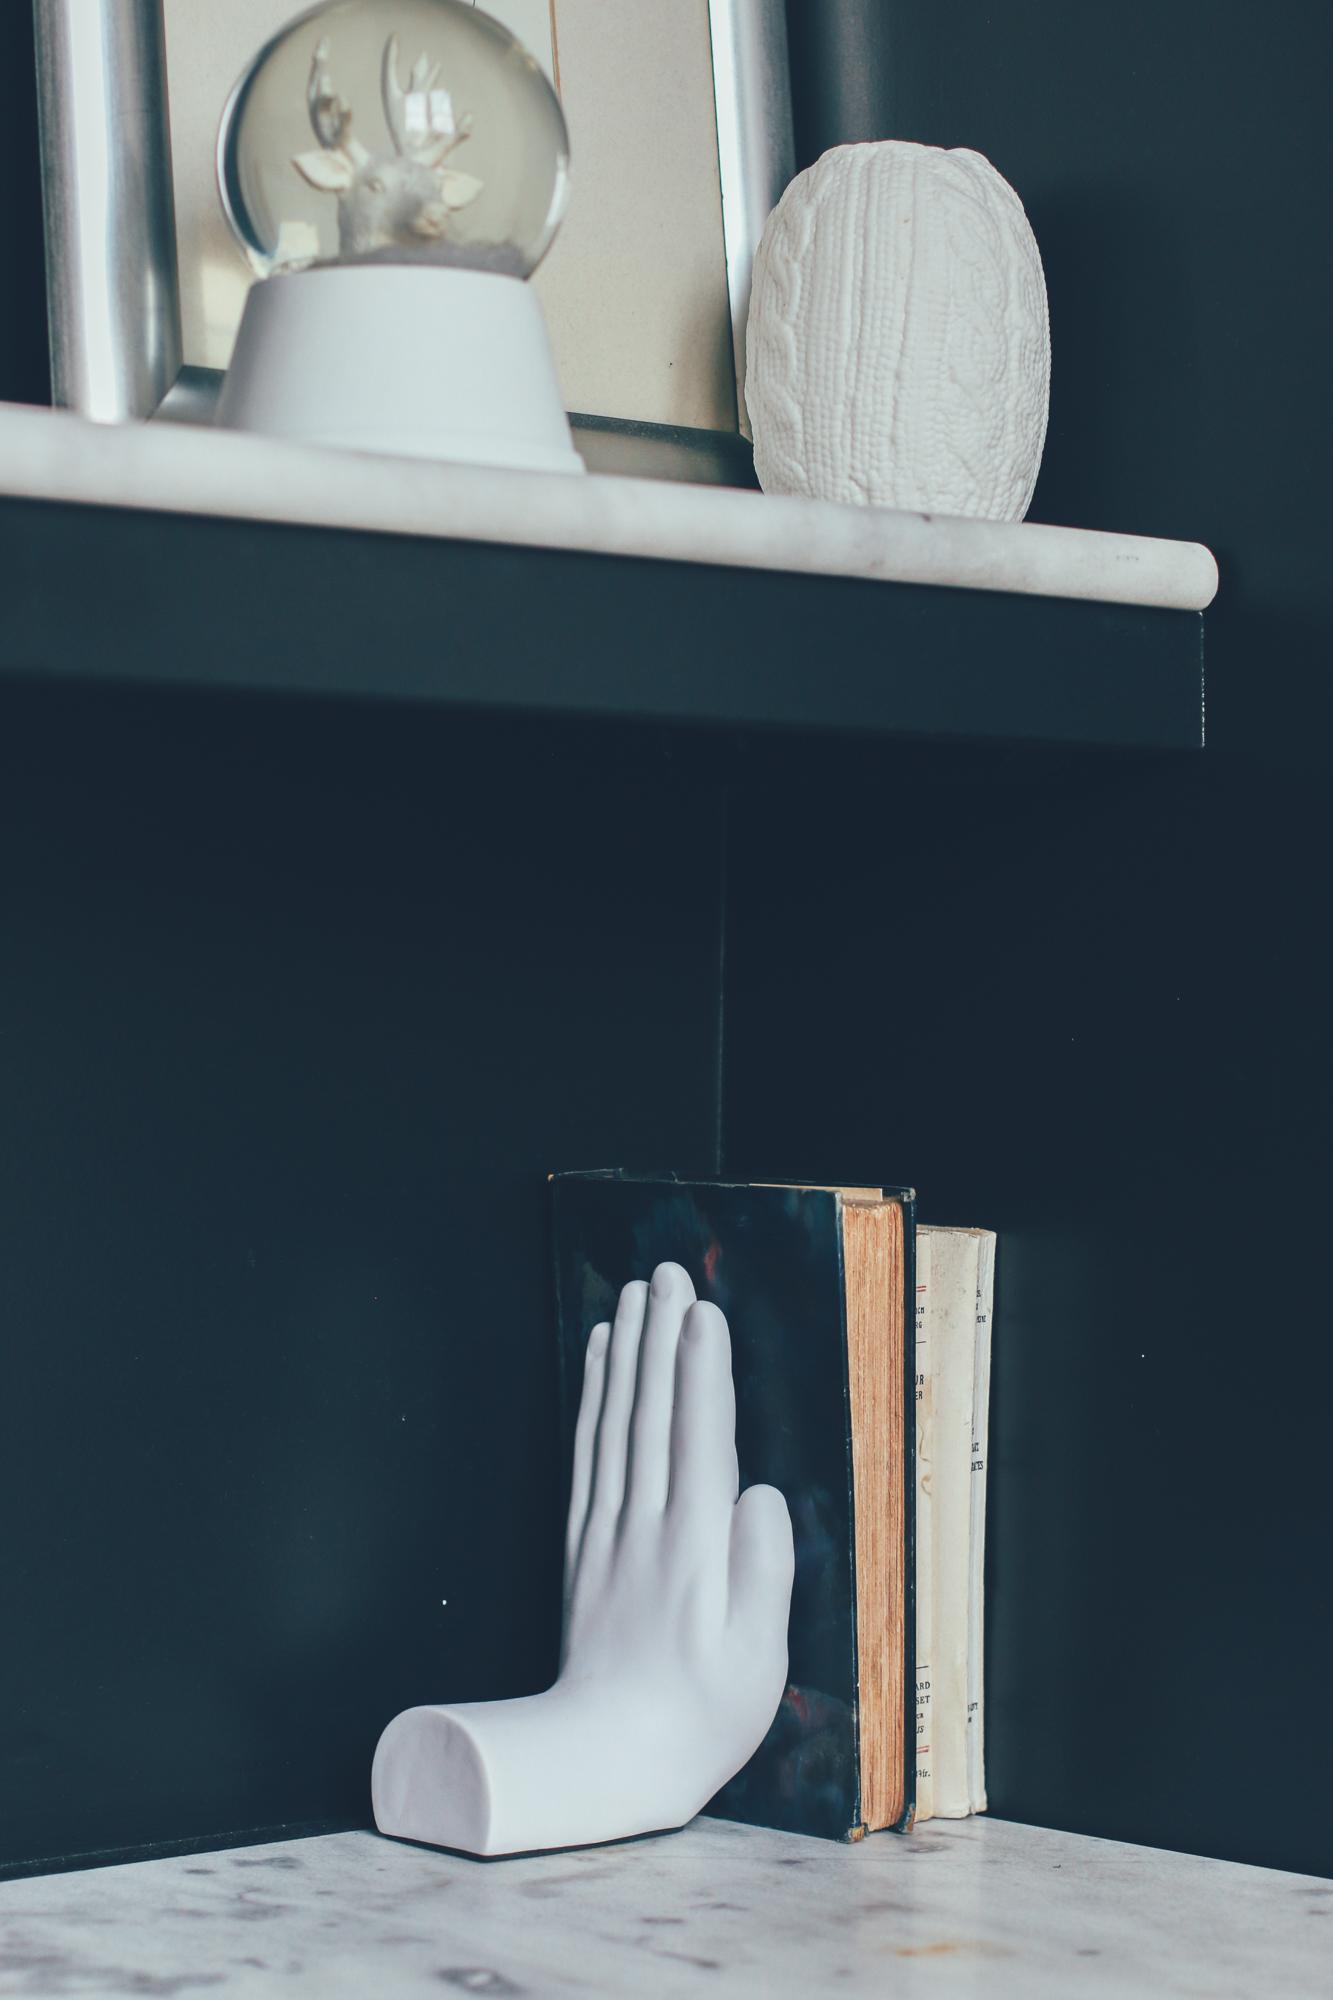 chez laurence du tilly caen normandie 17 helle flecken. Black Bedroom Furniture Sets. Home Design Ideas